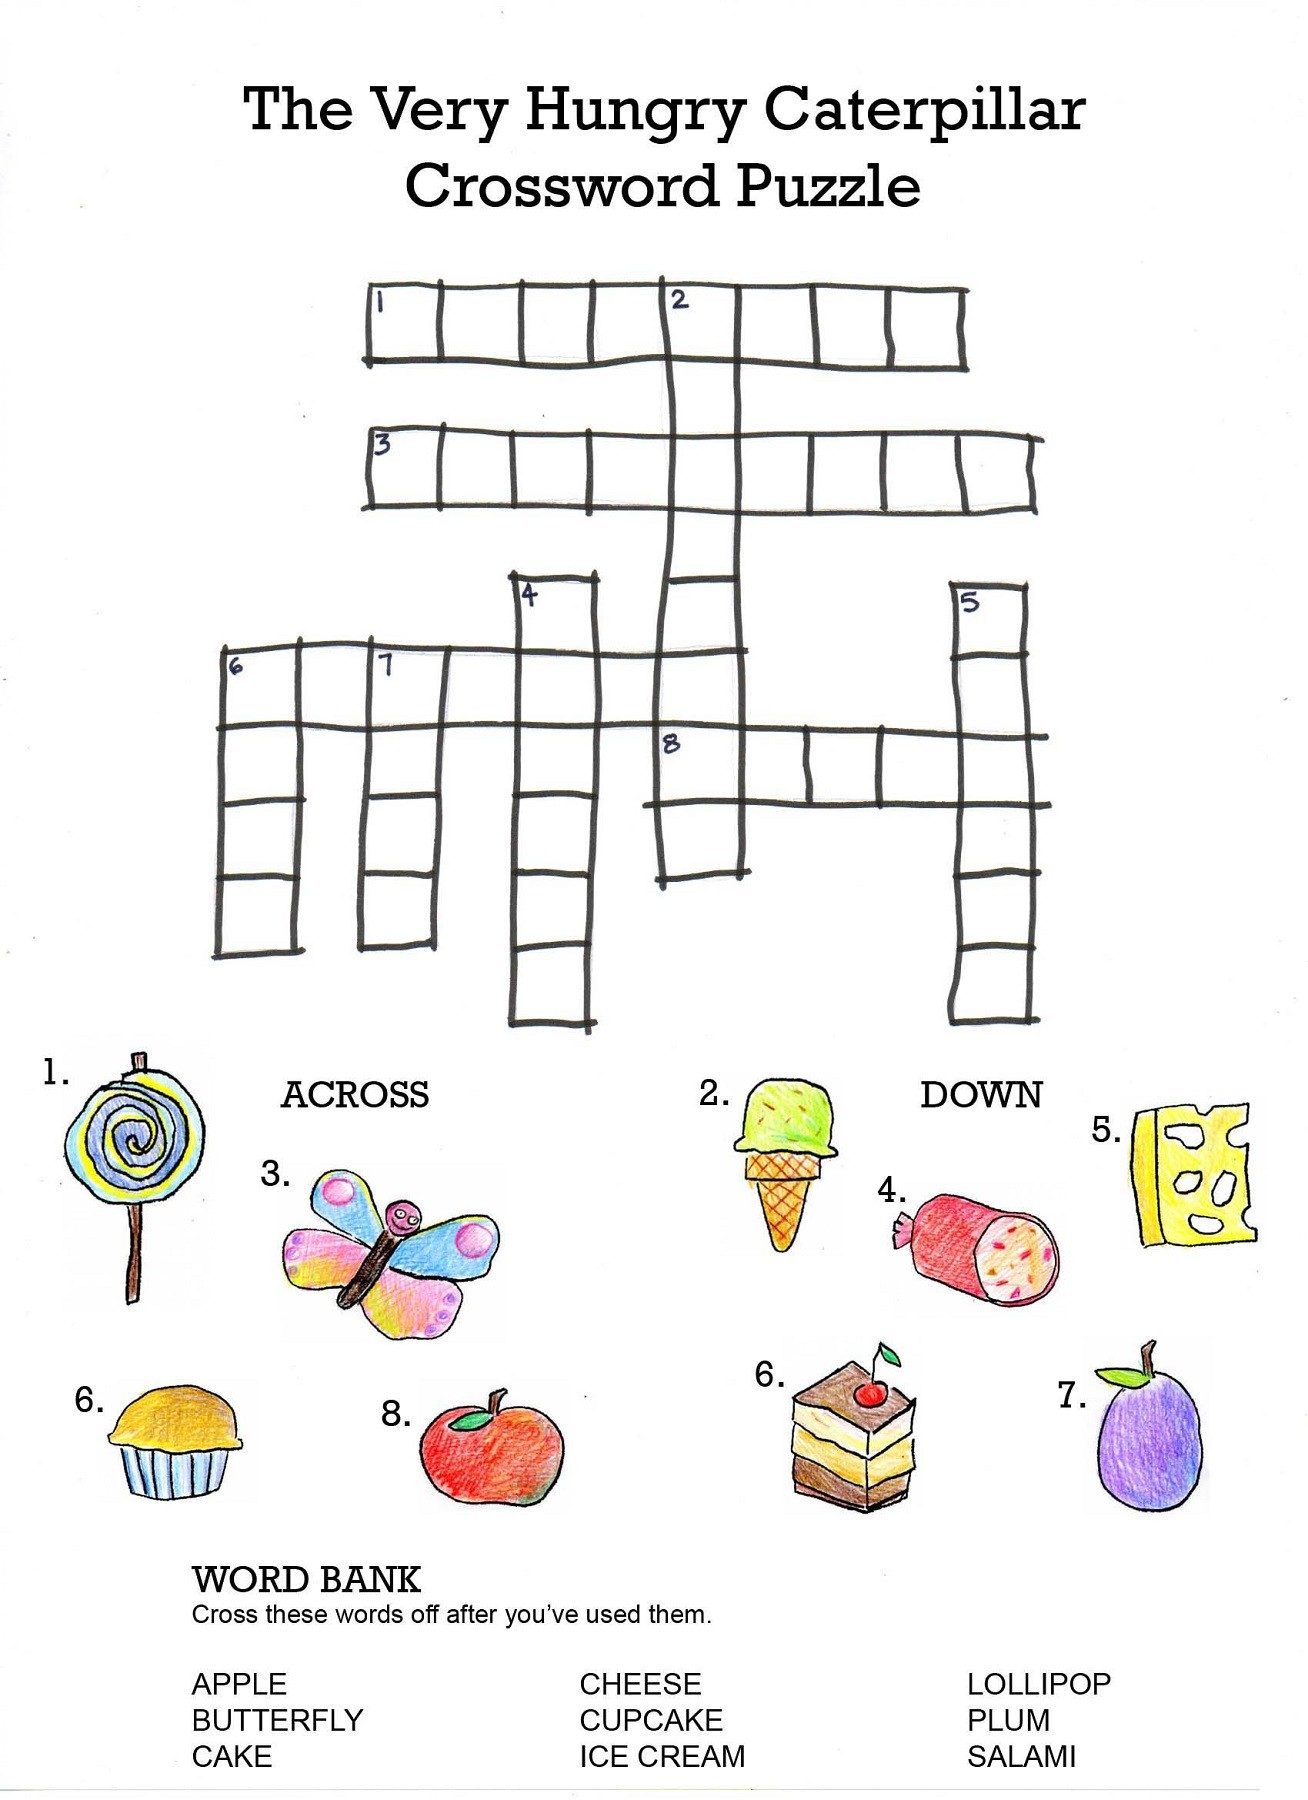 Very Hungry Caterpillar Crossword